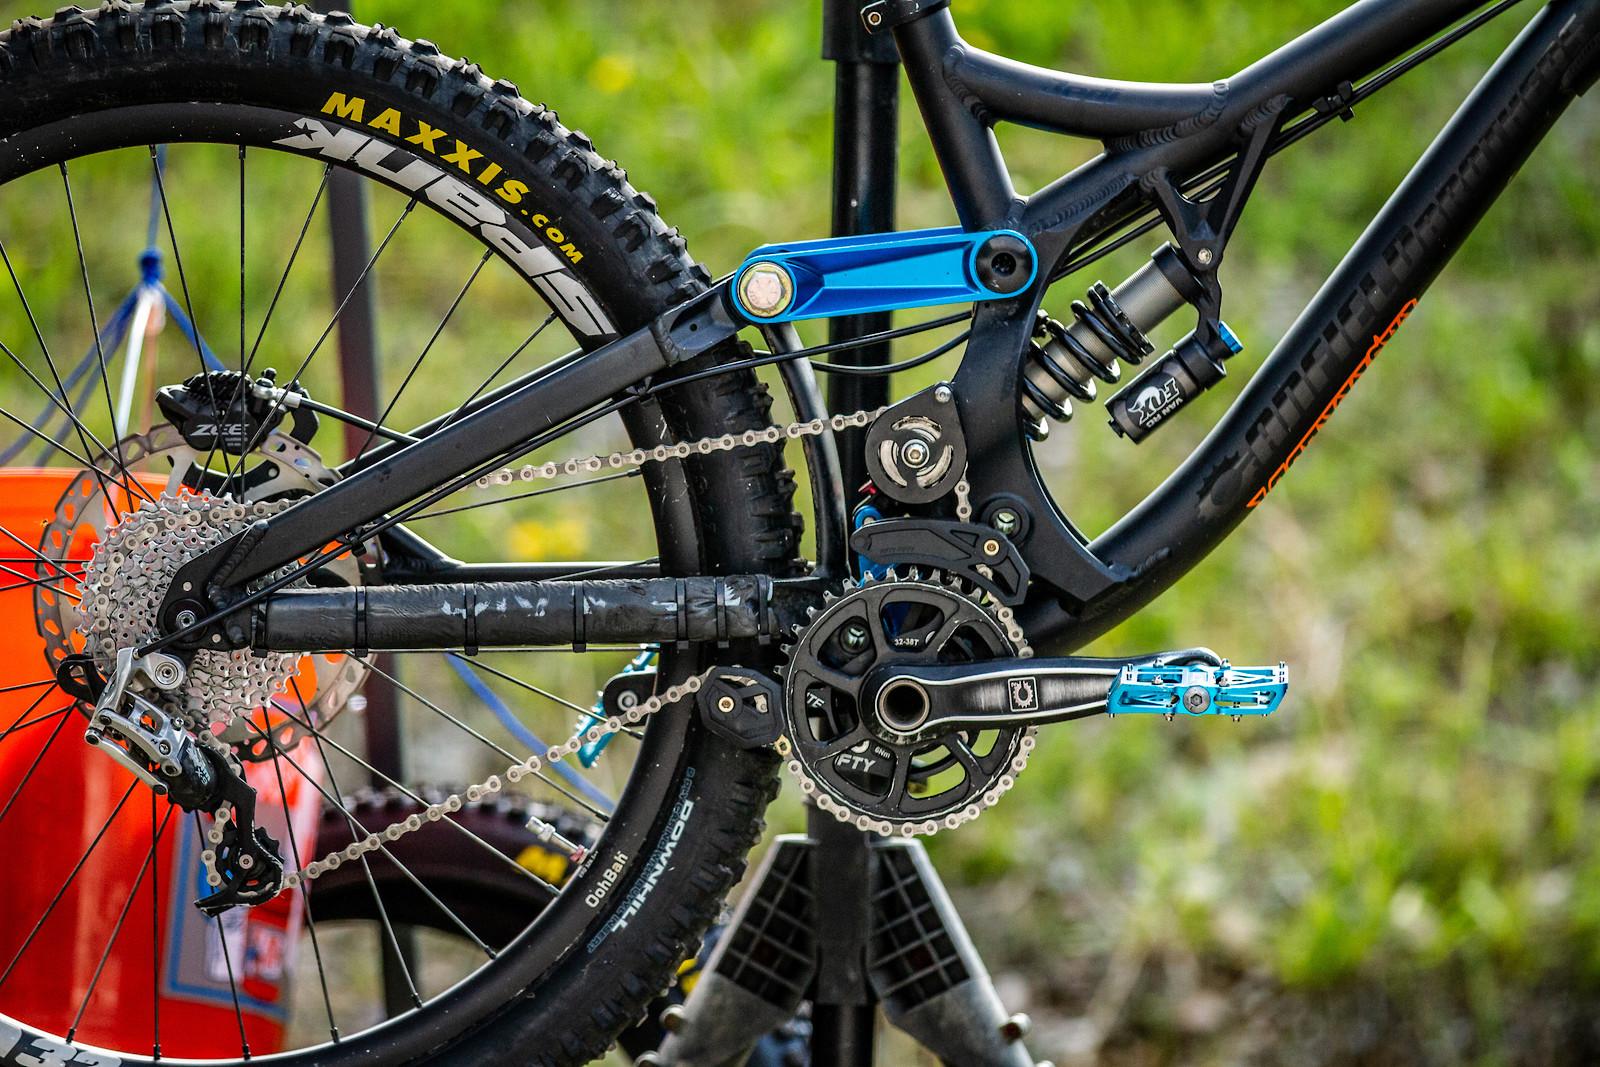 2017 Canfield Jedi - JackRice - Mountain Biking Pictures - Vital MTB